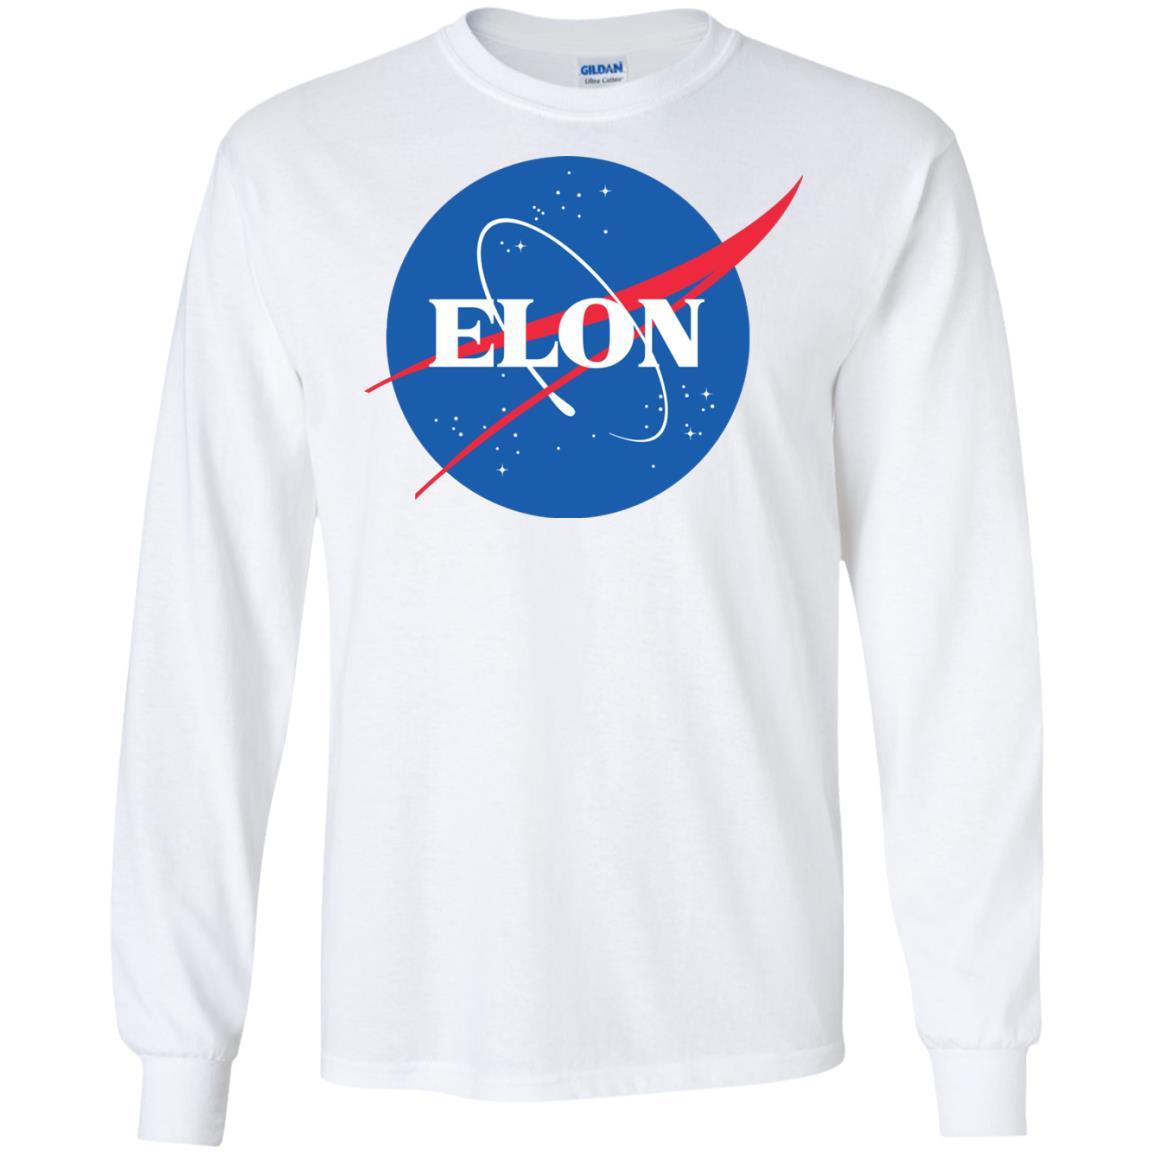 image 286px Elon Nasa parody t shirt, hoodies, tank top